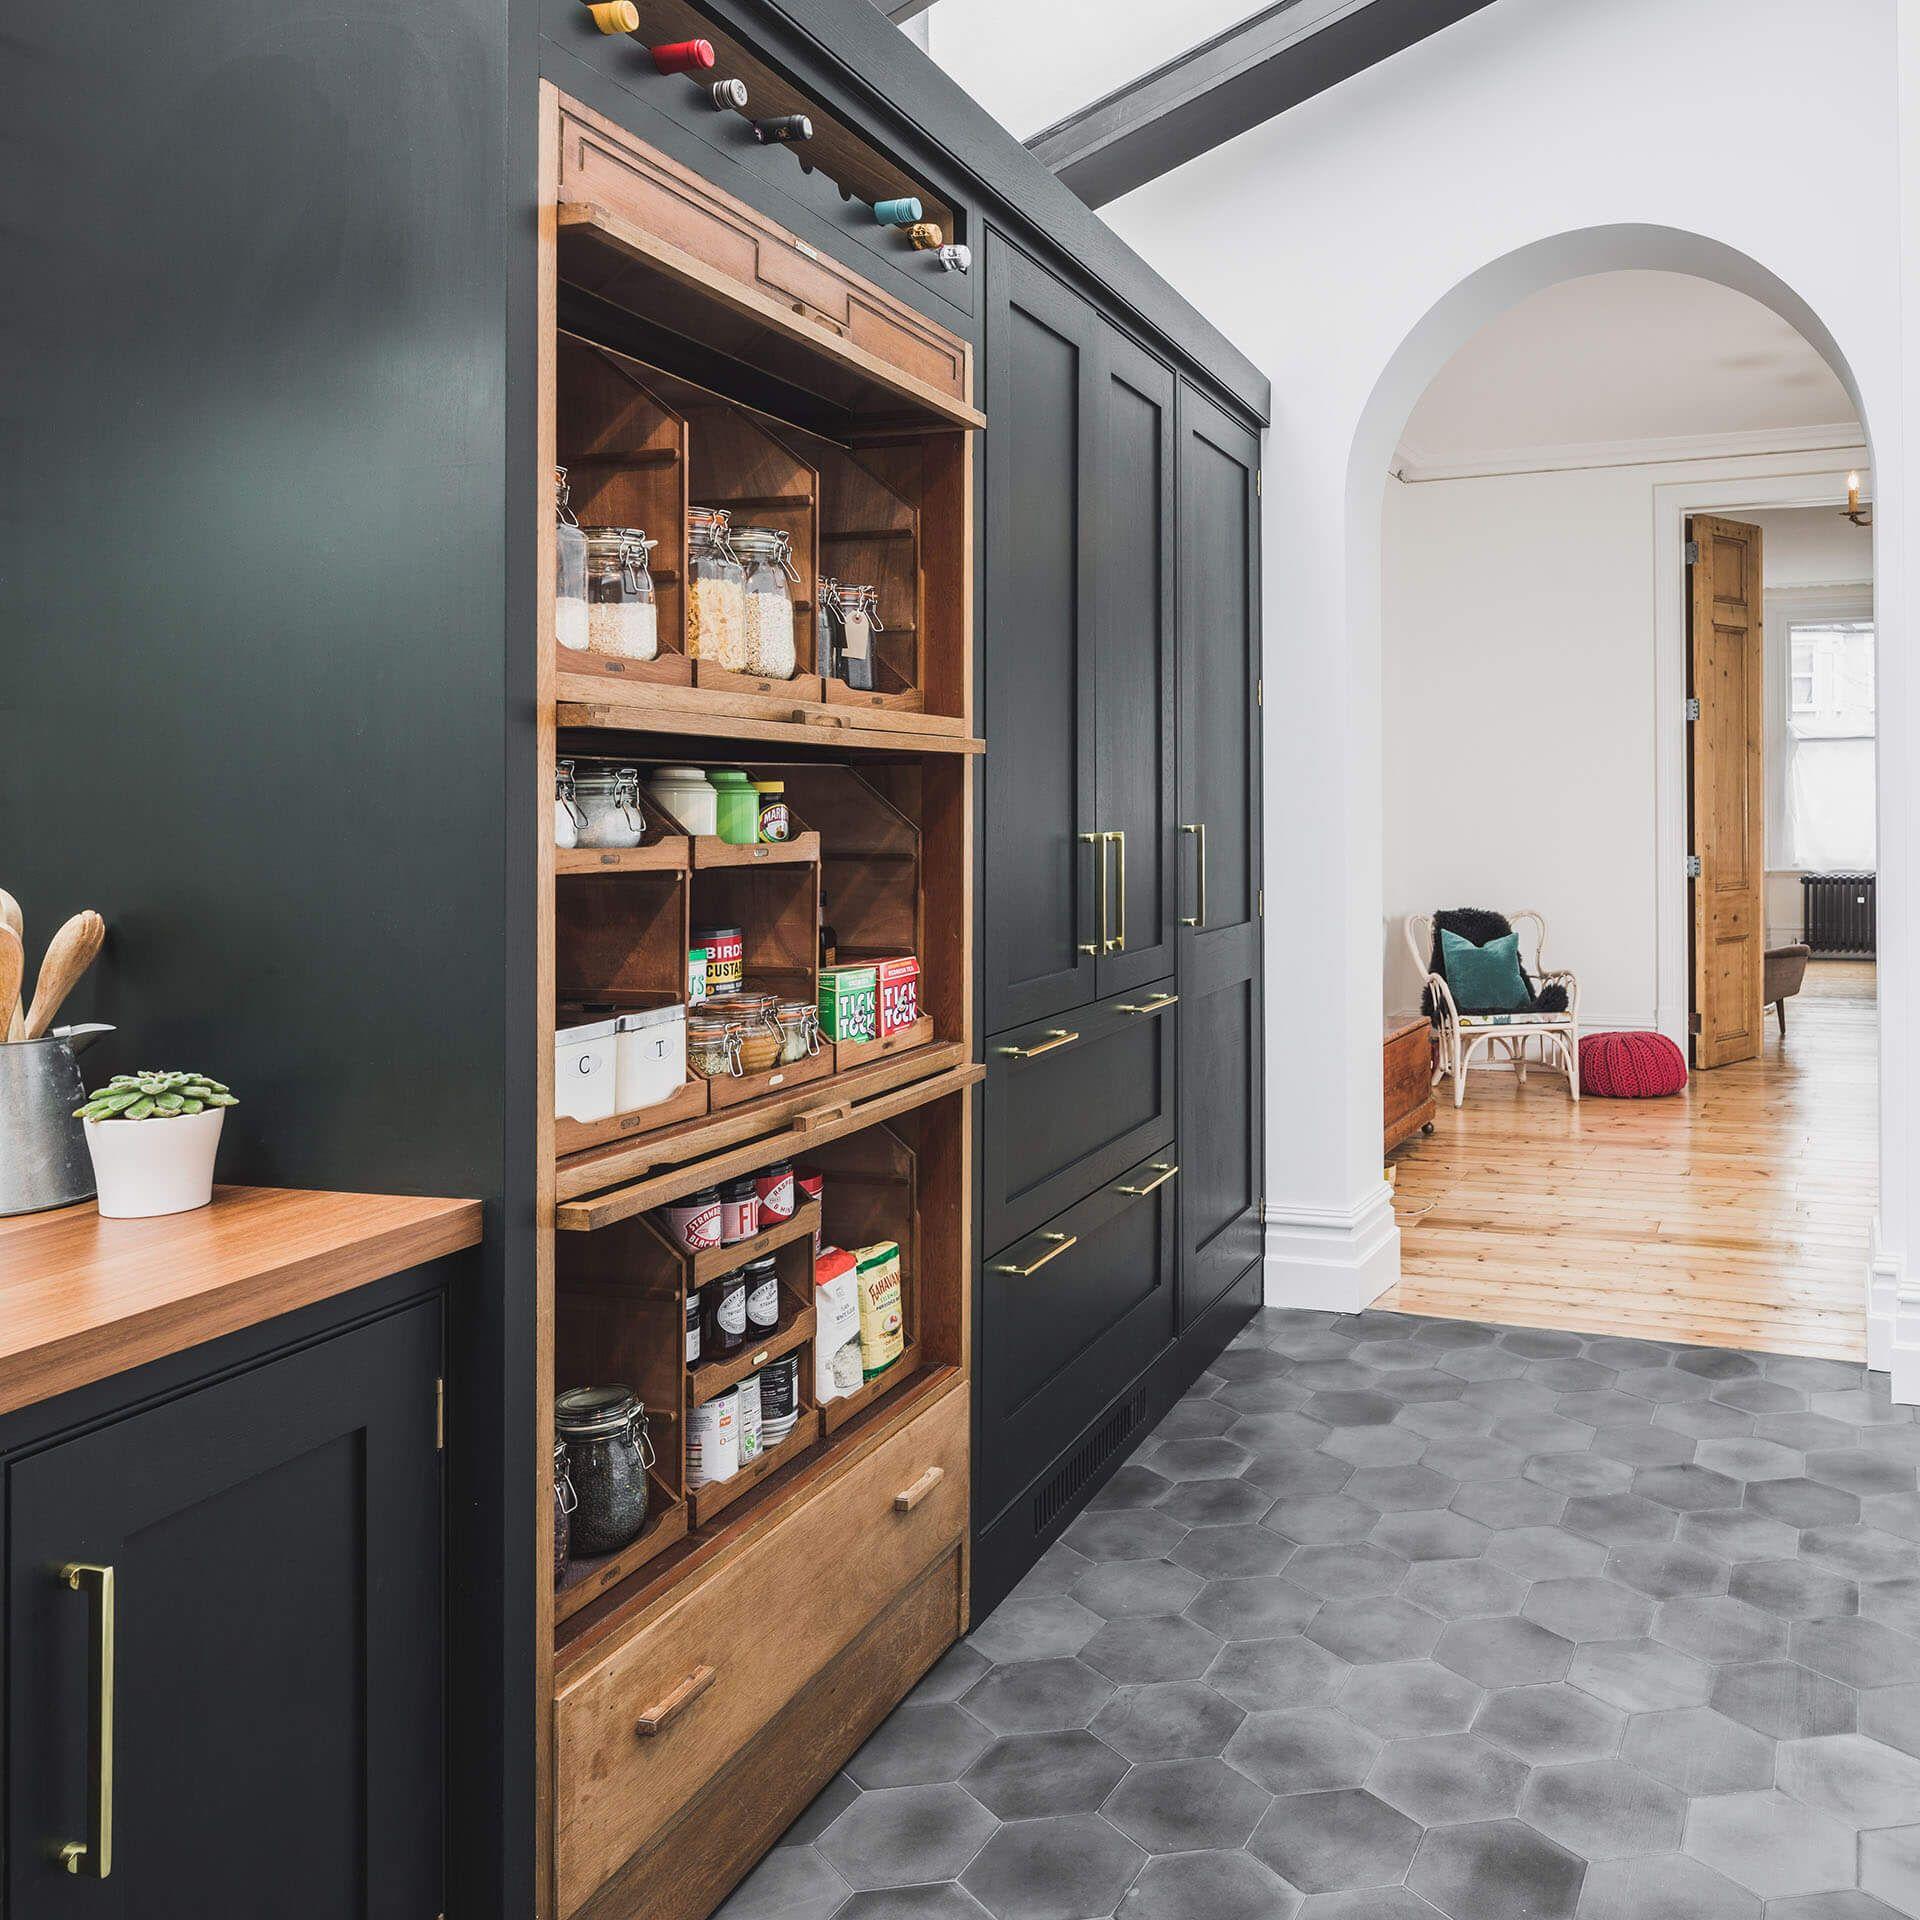 Sustainable Kitchens Bespoke Kitchens Across The Uk Sustainable Kitchen Dark Green Kitchen Green Kitchen Cabinets